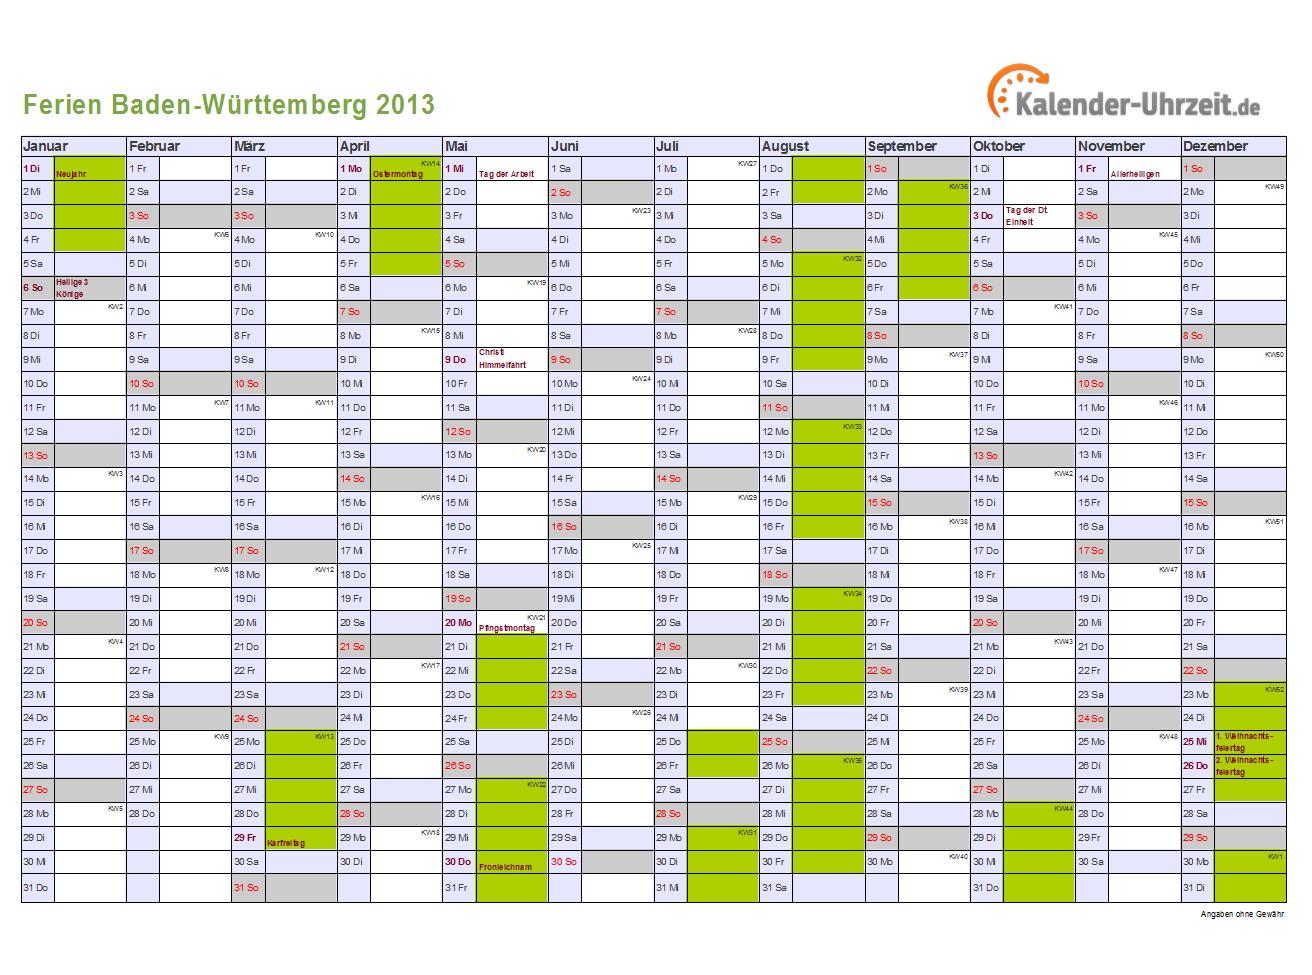 1312 x 975 · 95 kB · png, Ferienkalender 2013 Baden-Württemberg mit ...